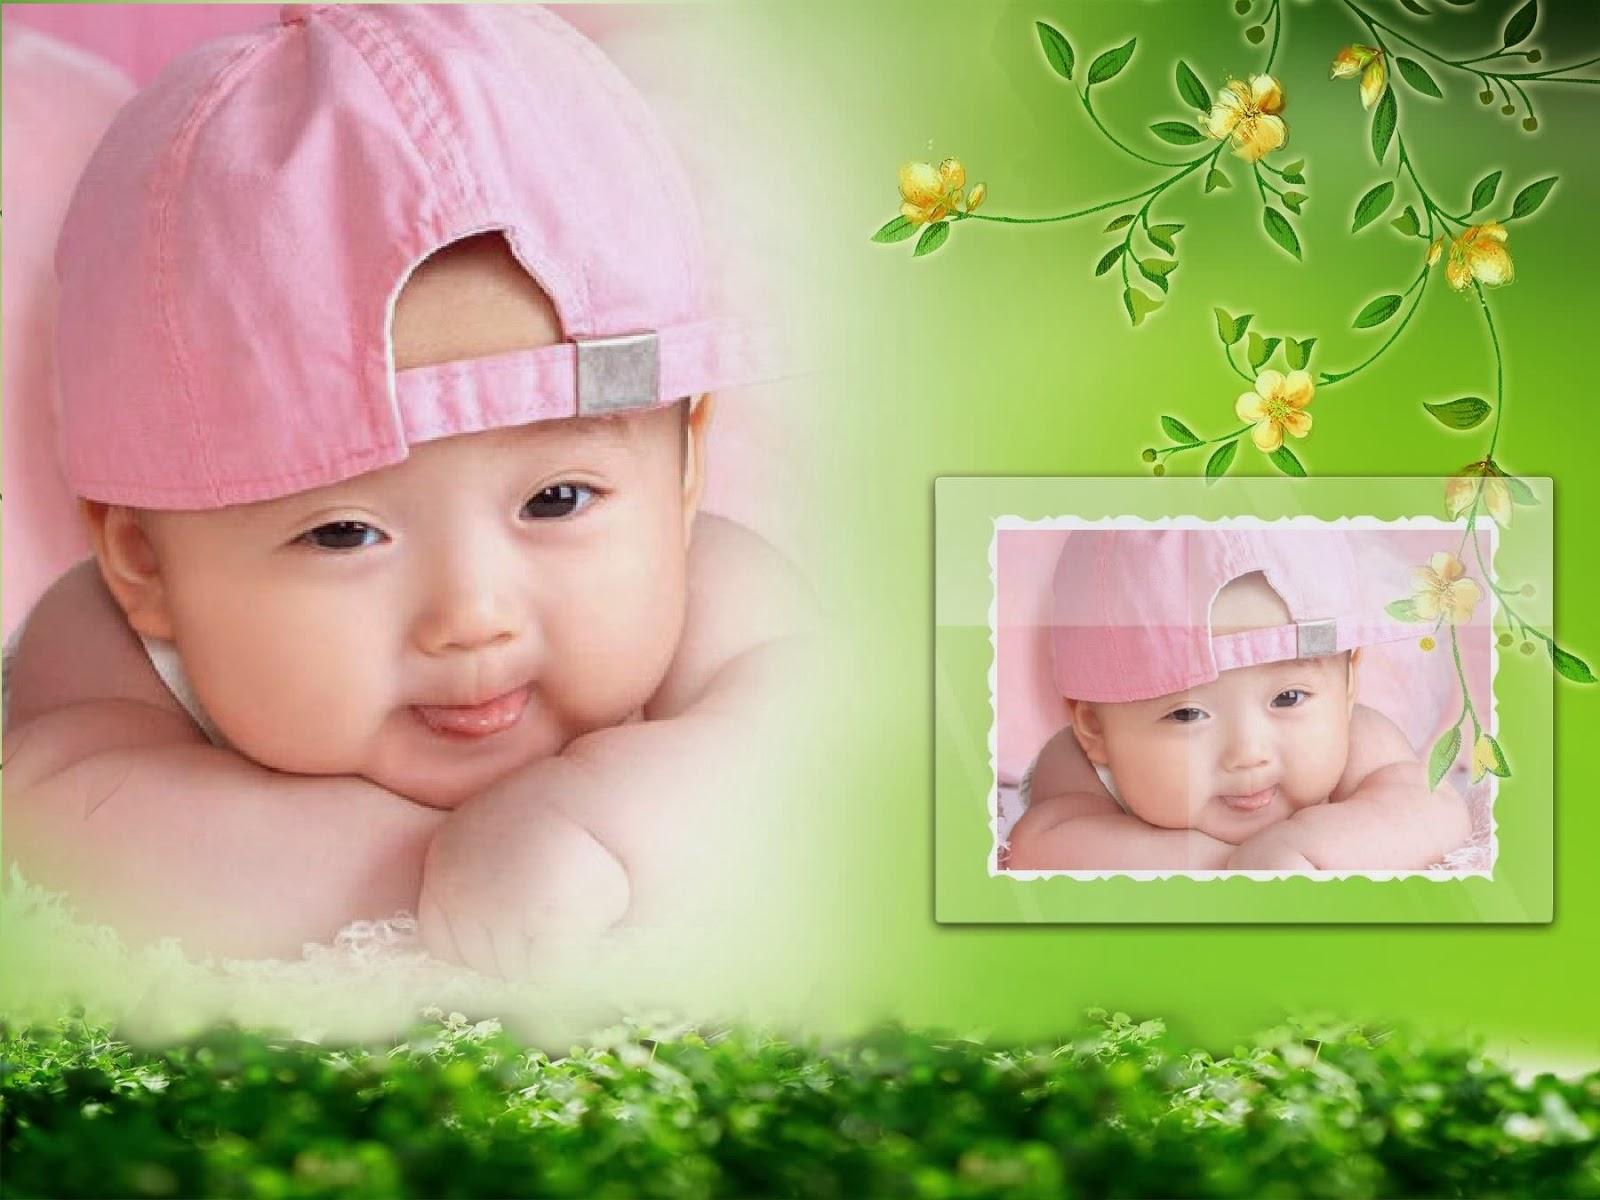 Cute Babies Hd Wallpapers Cute Baby Wallpaper Hd Free